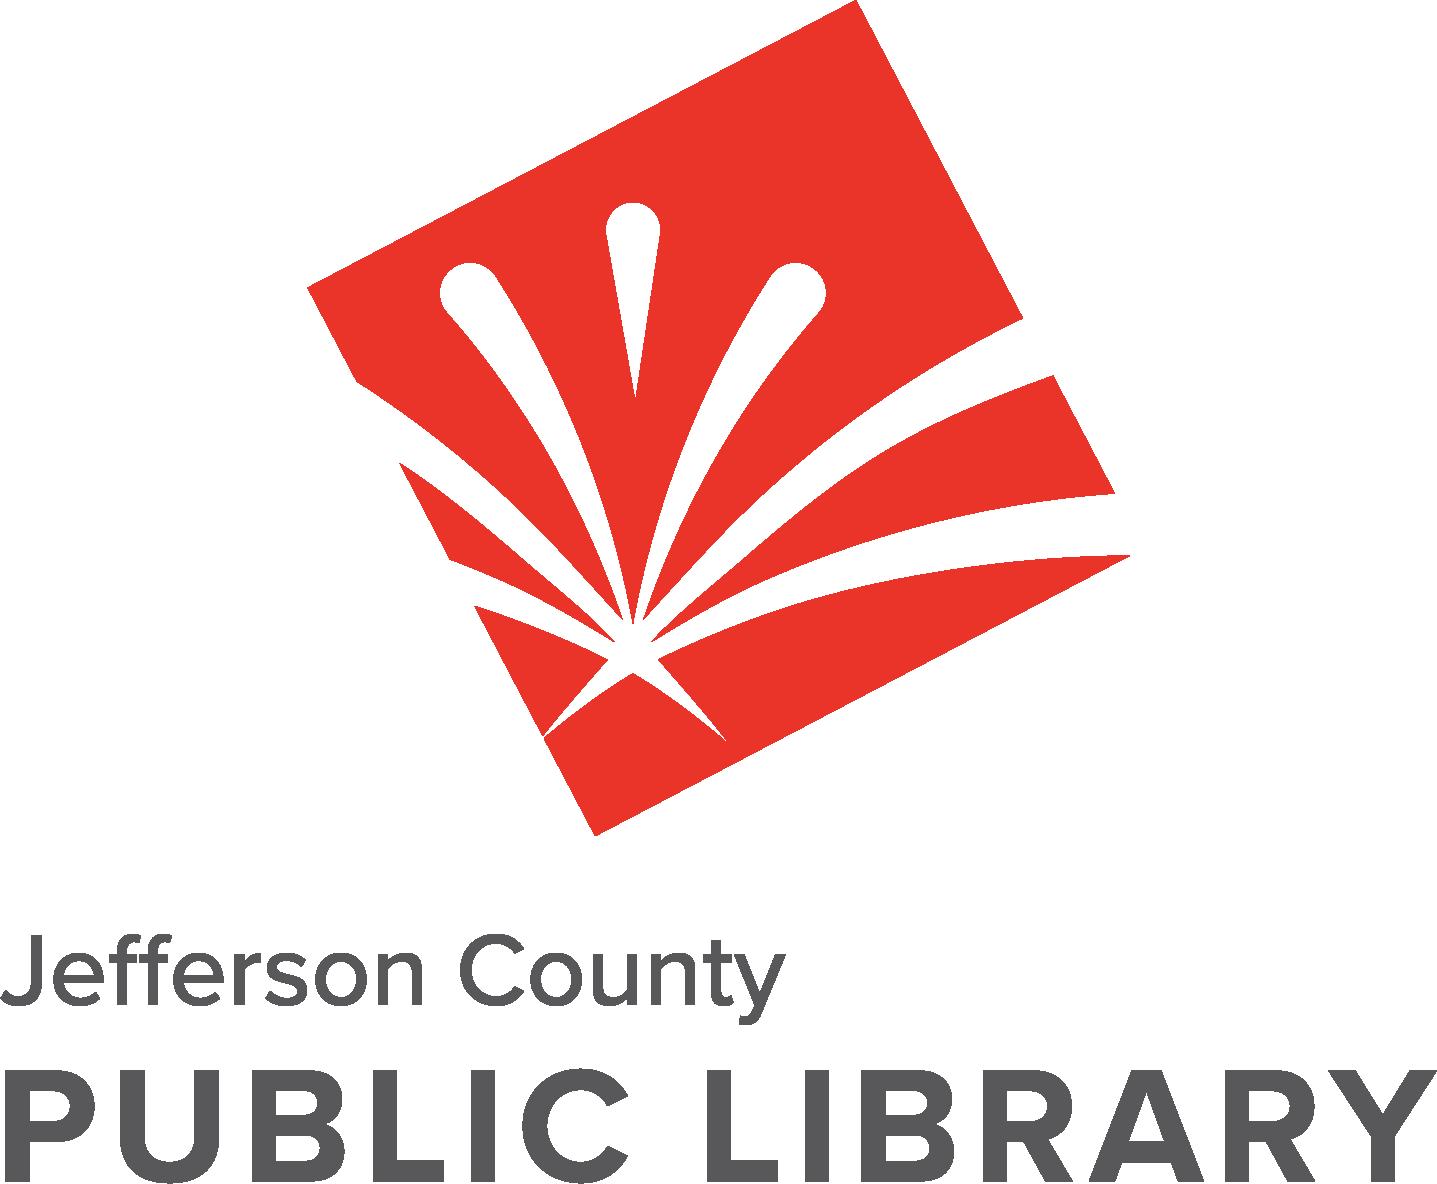 Jefferson County Public Library logo